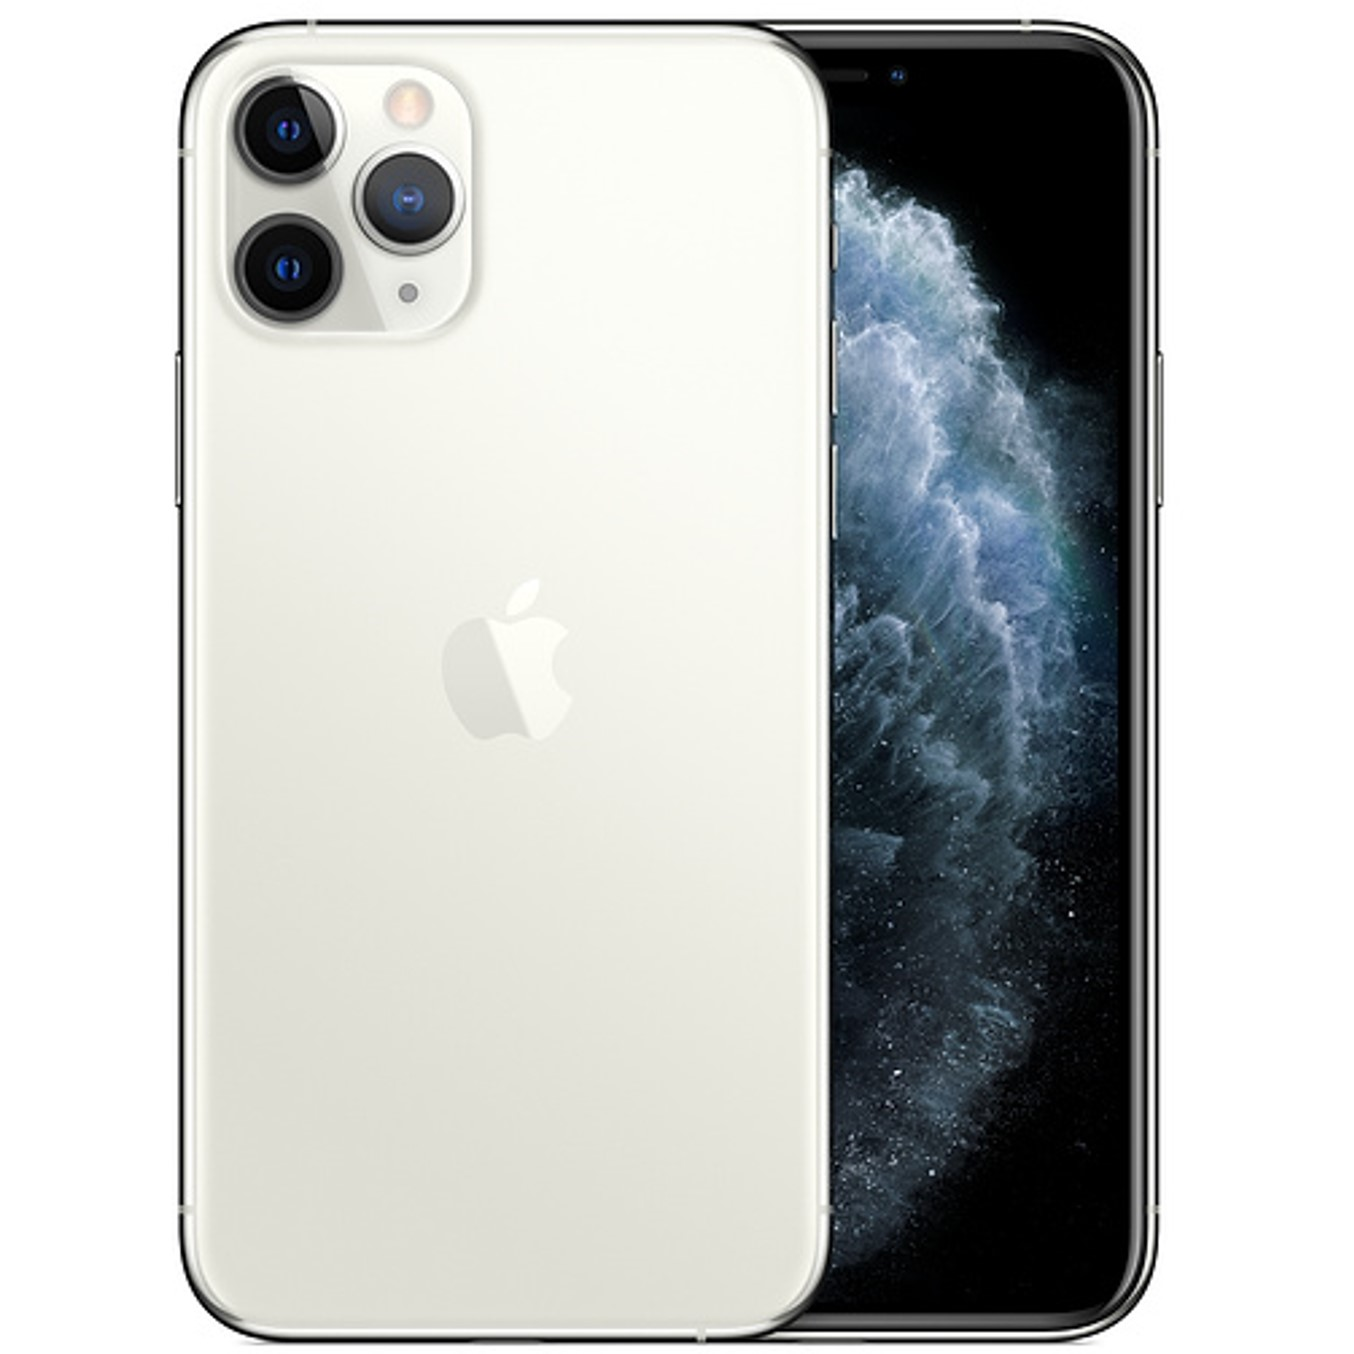 Telefono movil smartphone apple iphone 11 pro 64gb silver - 5.8pulgadas - dual sim - triple camara trasera